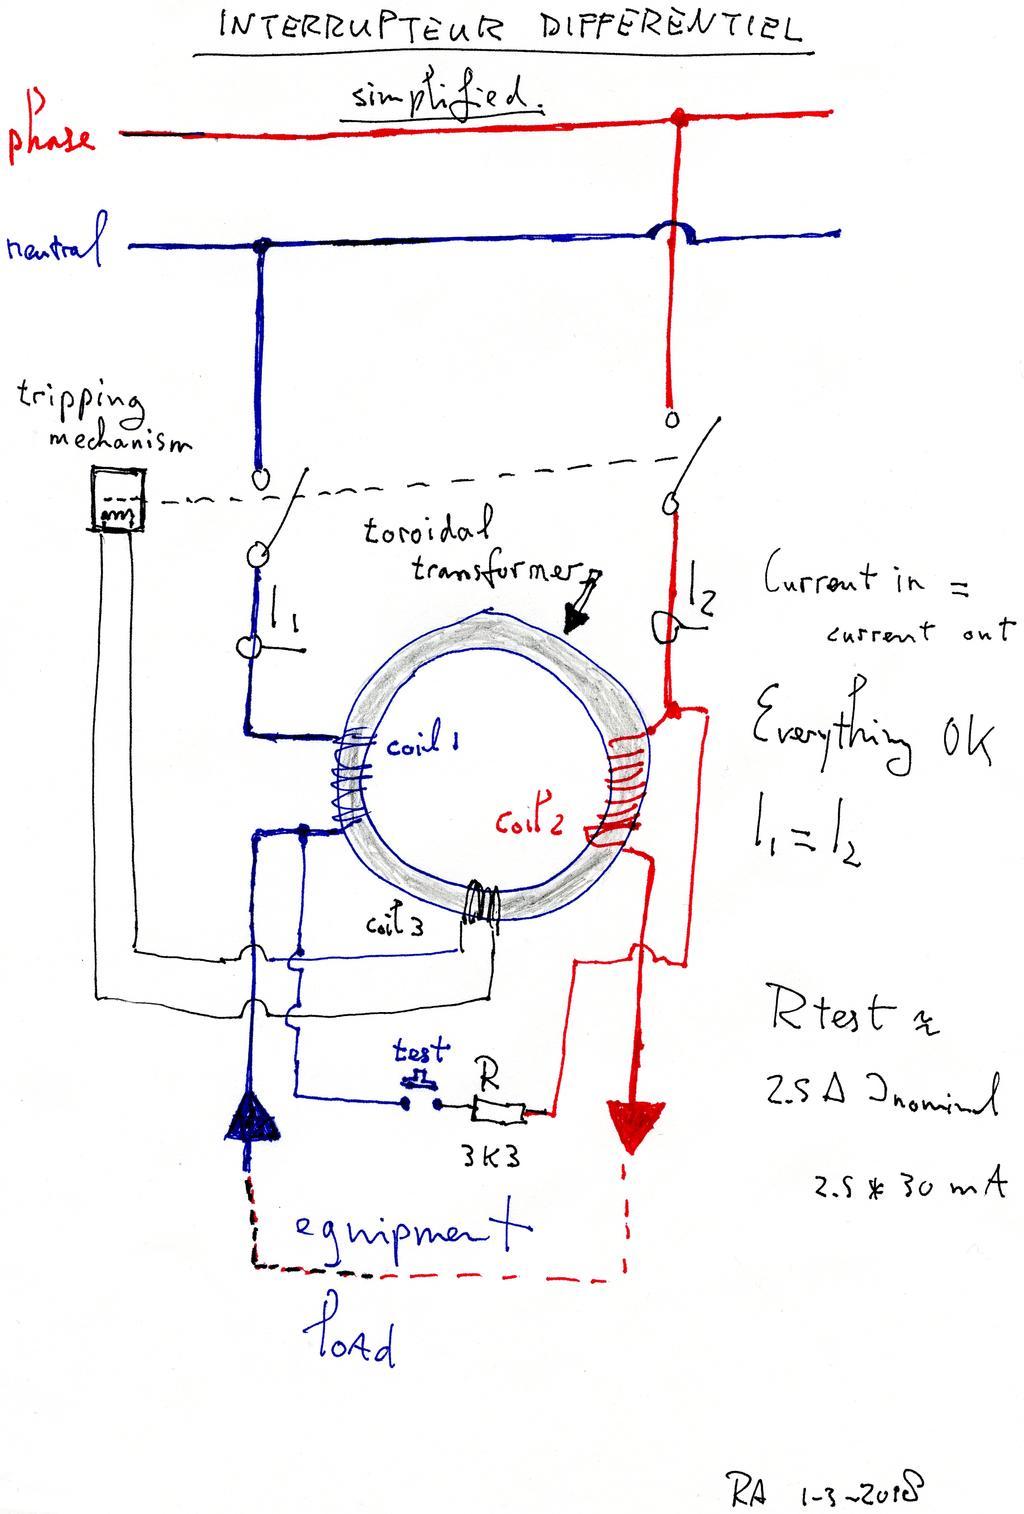 wiring an interrupteur differentiel. Black Bedroom Furniture Sets. Home Design Ideas